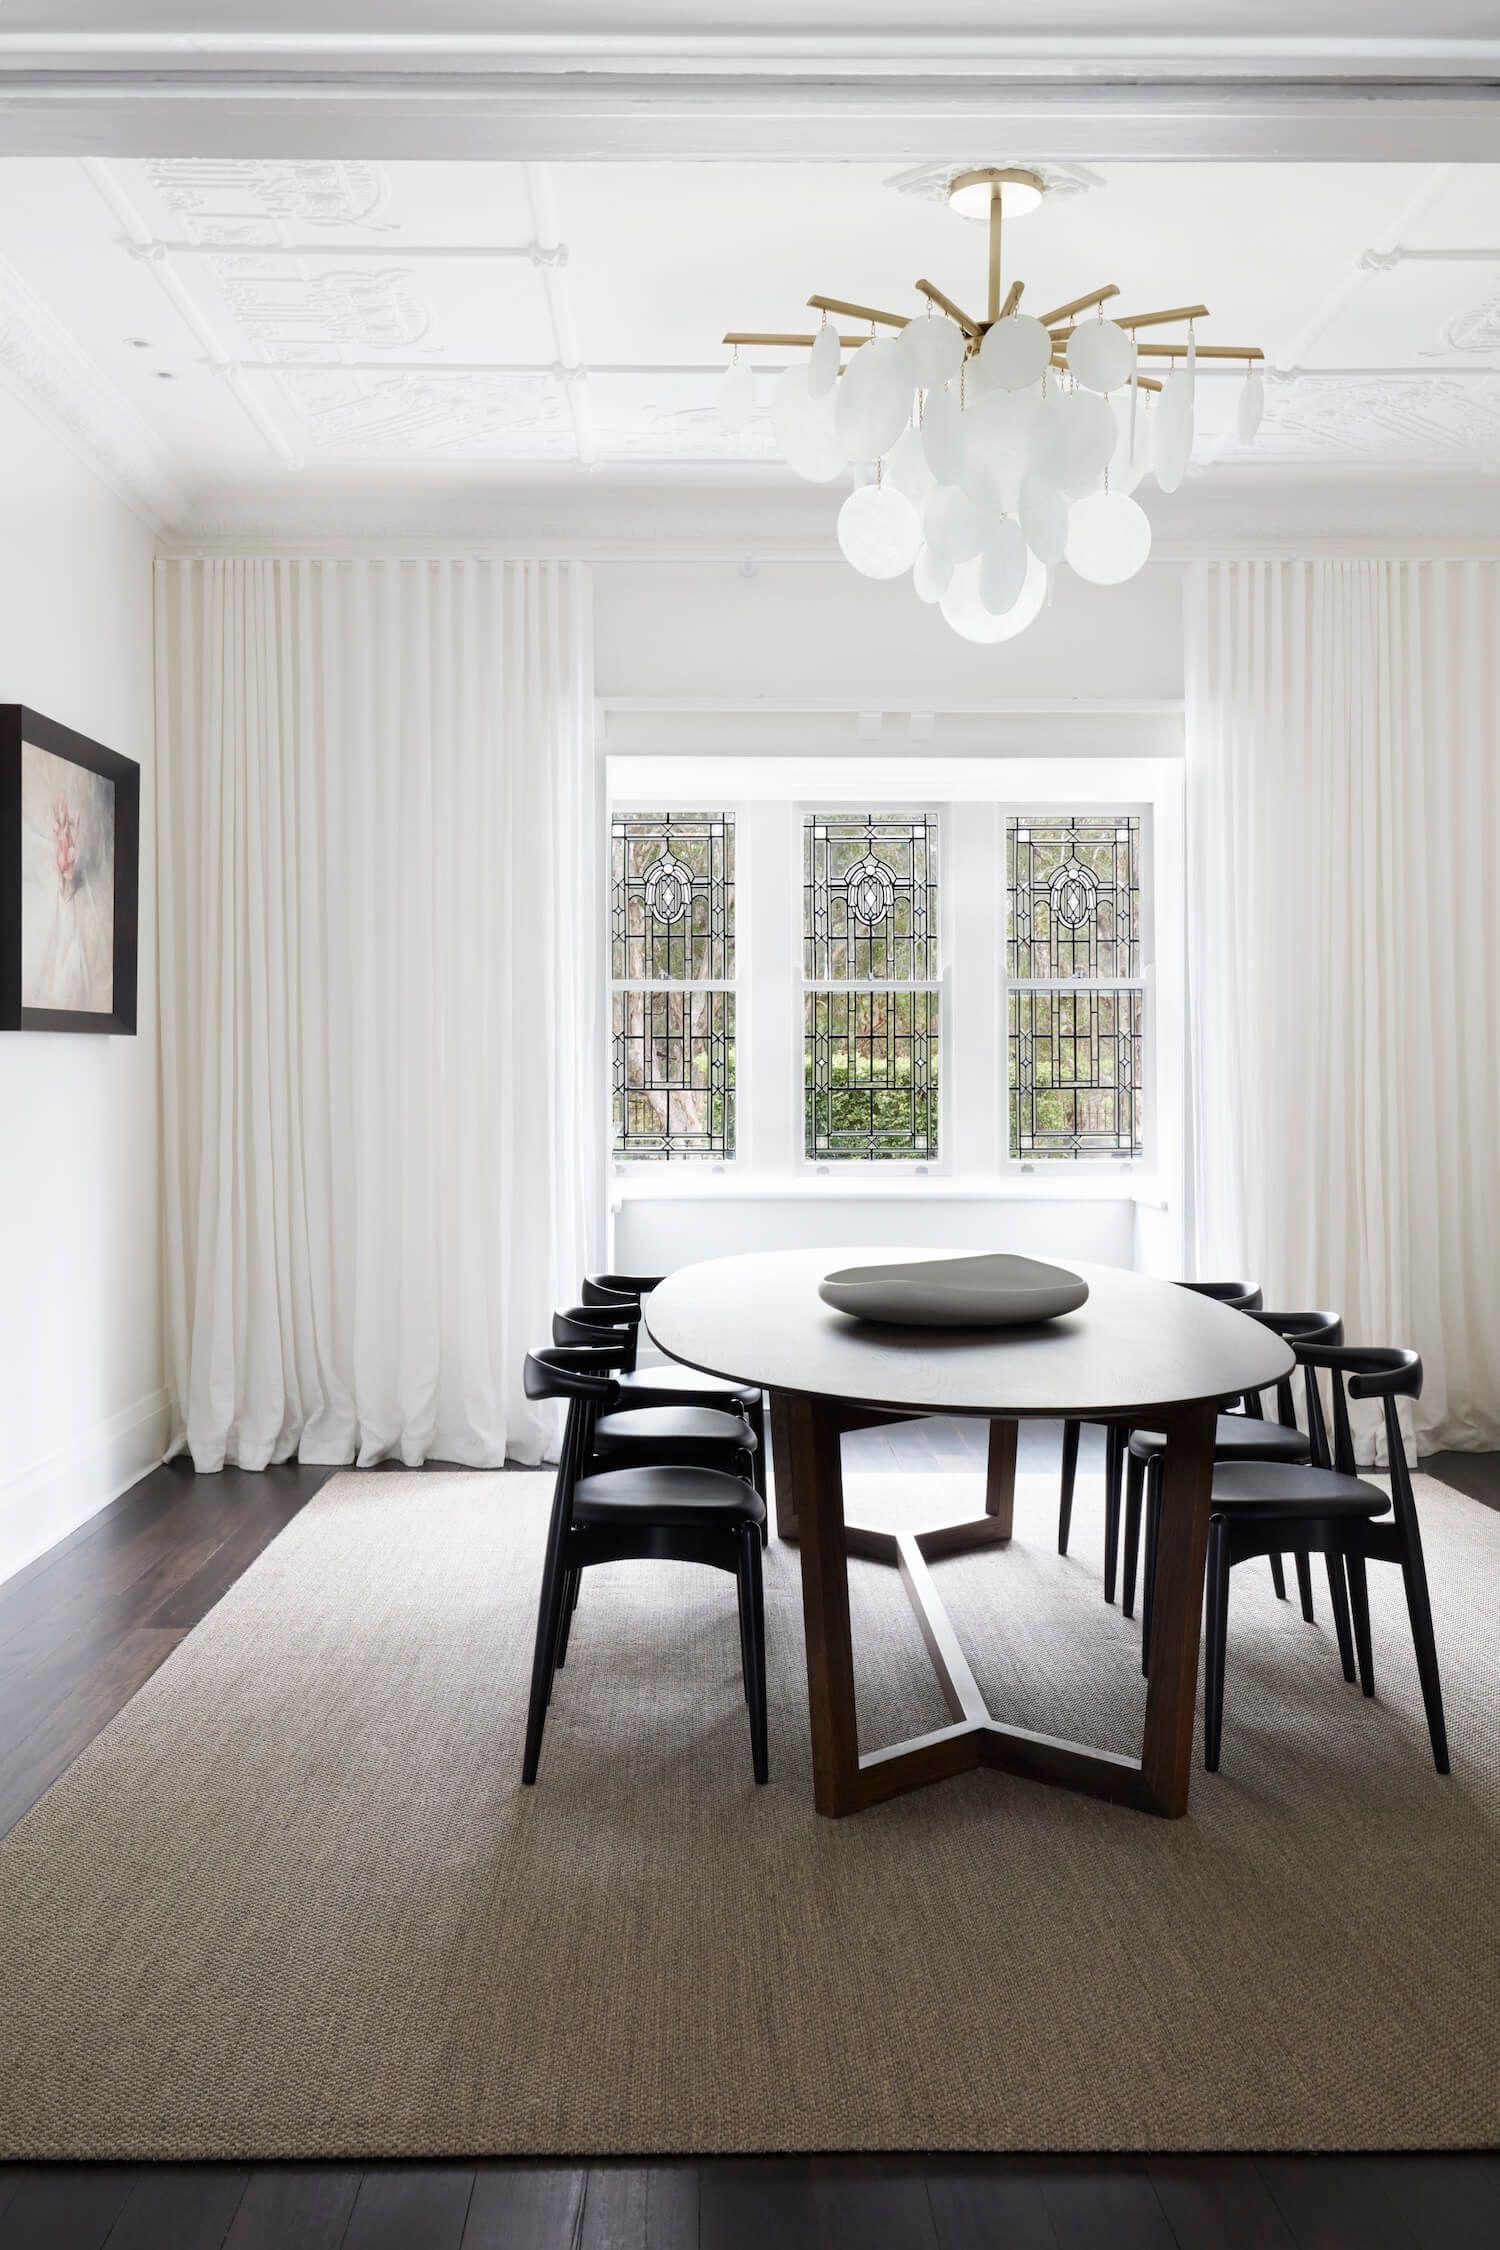 Centennial Park House By Madeleine Blanchfield Dining Room